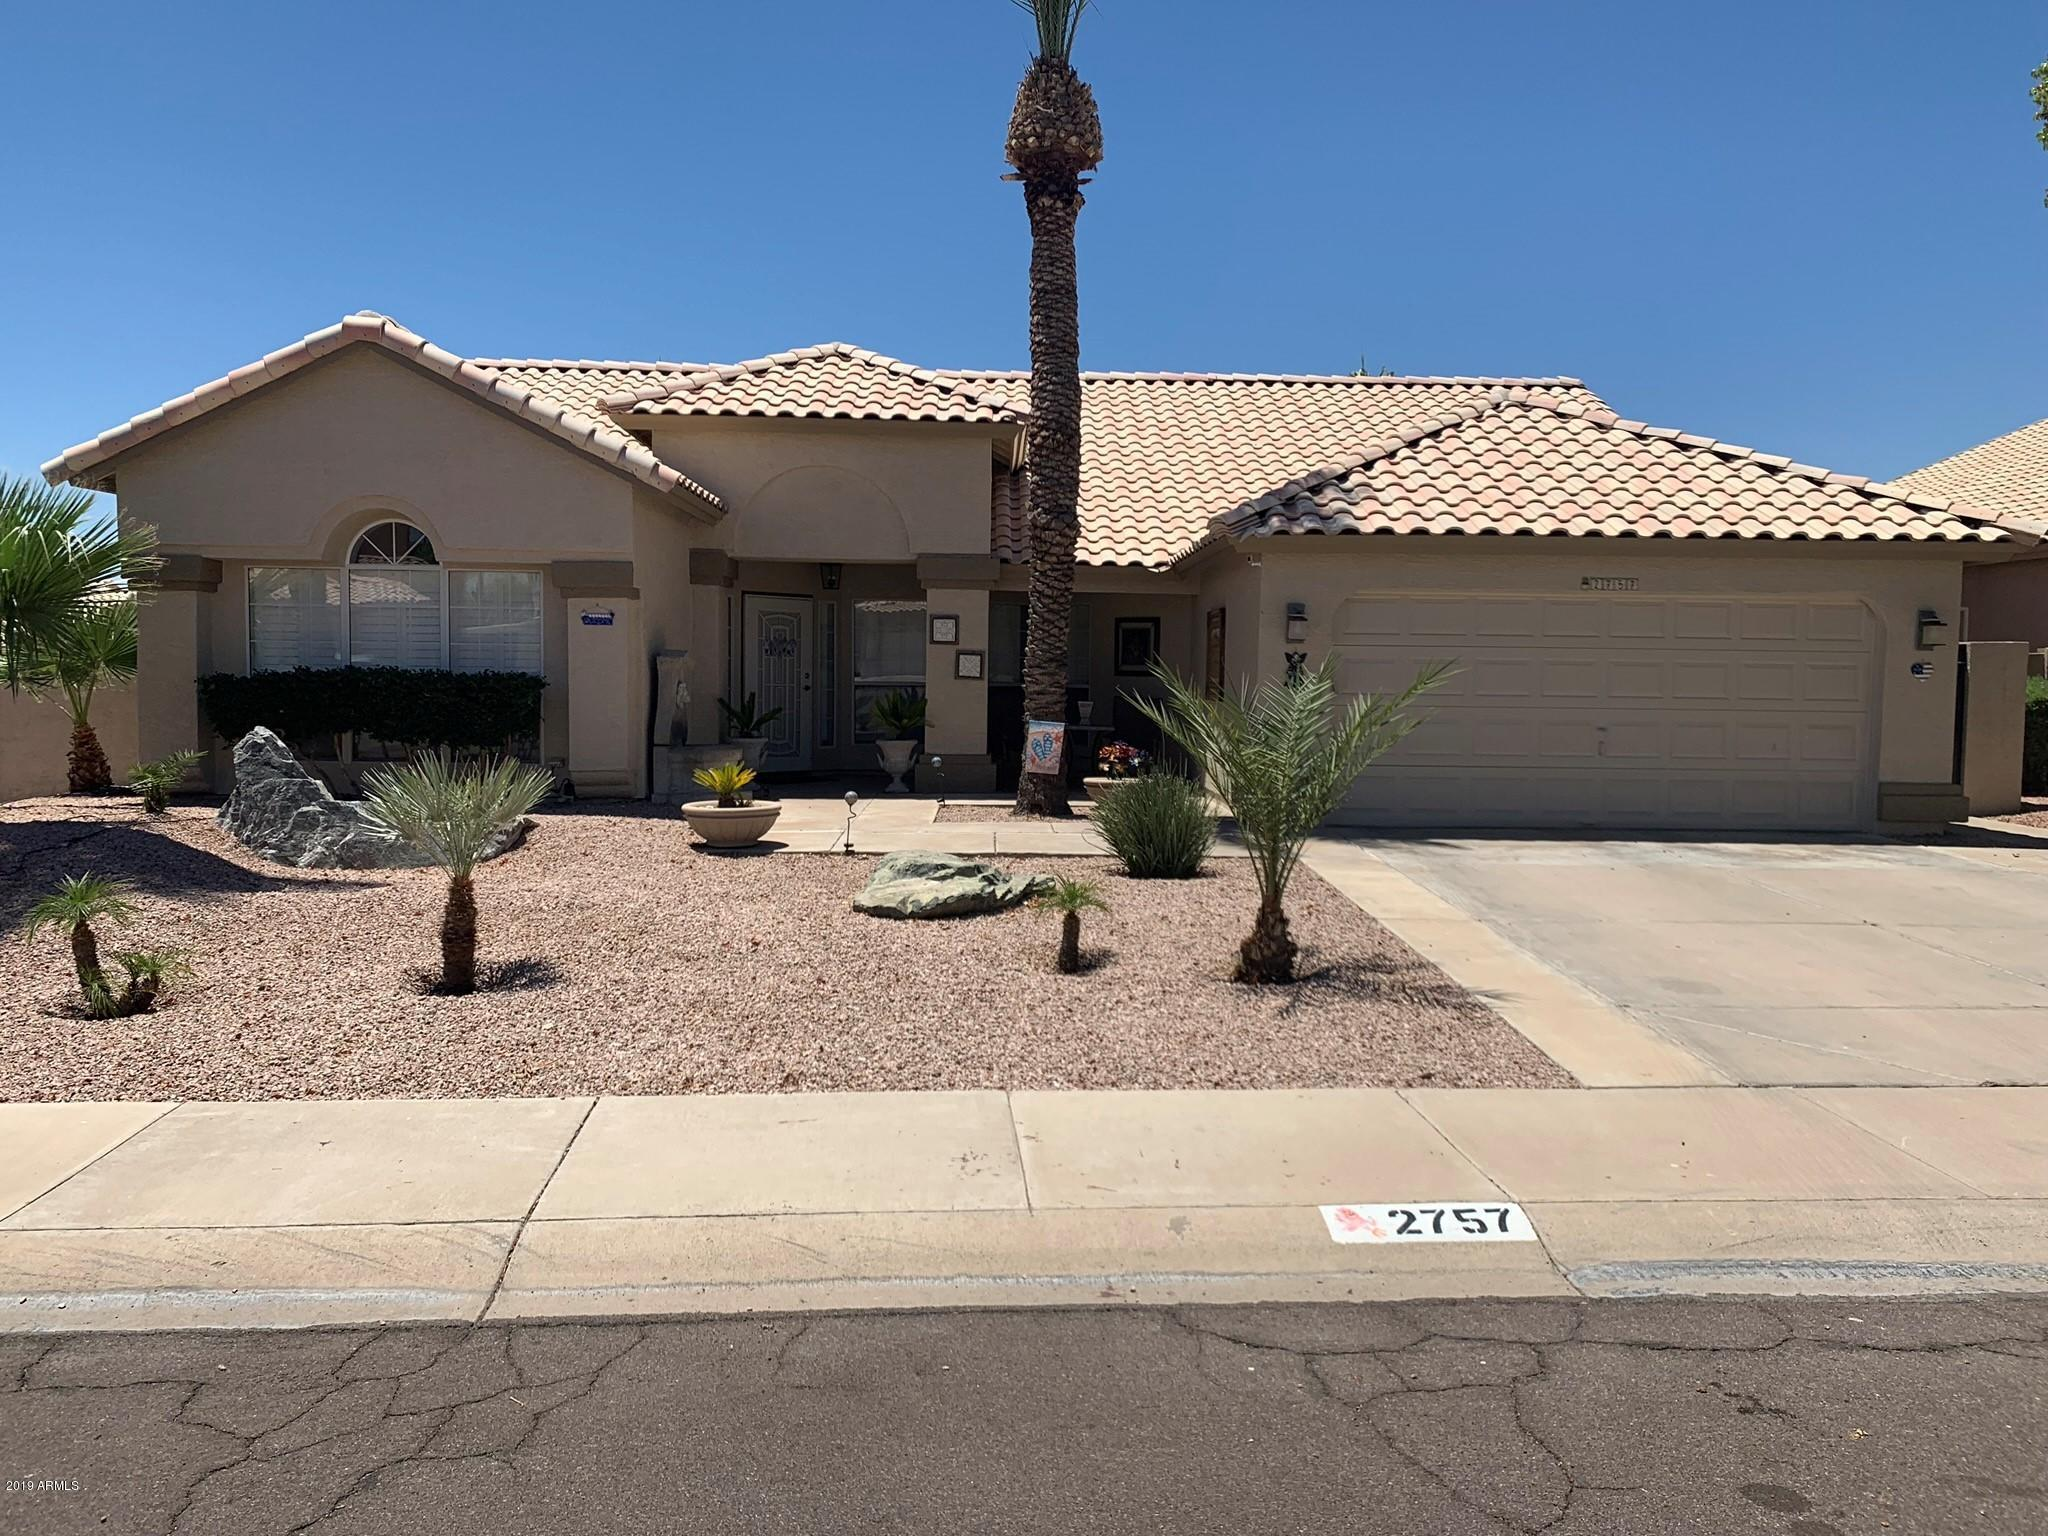 Photo of 2757 E WINDMERE Drive, Phoenix, AZ 85048